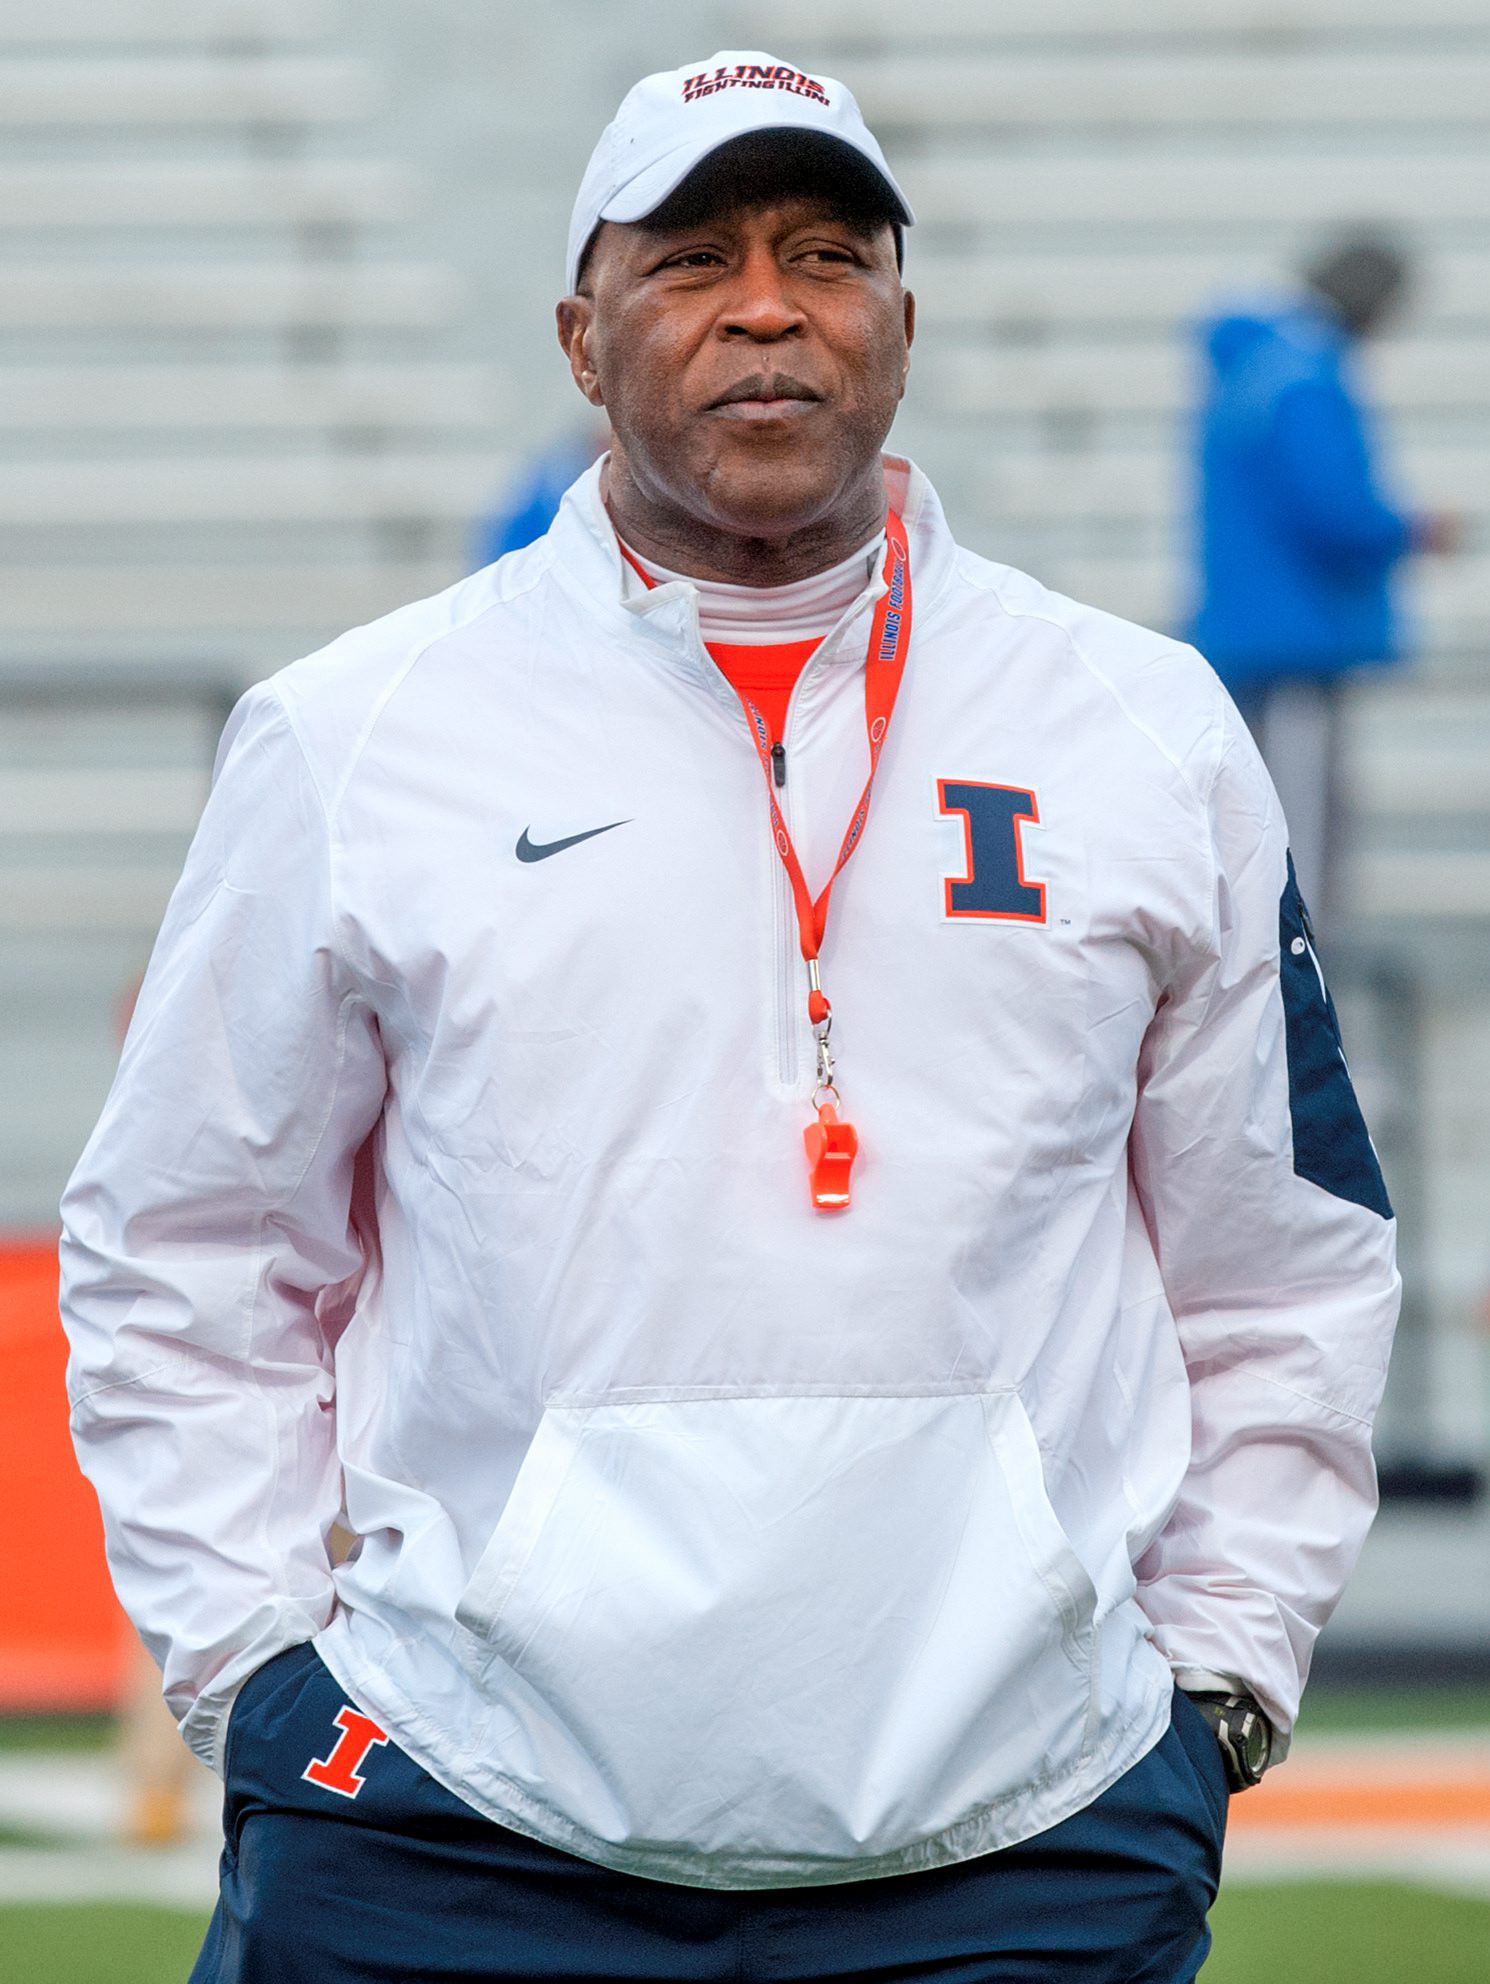 Lovie Smith's debut as Illinois coach has student interest ...